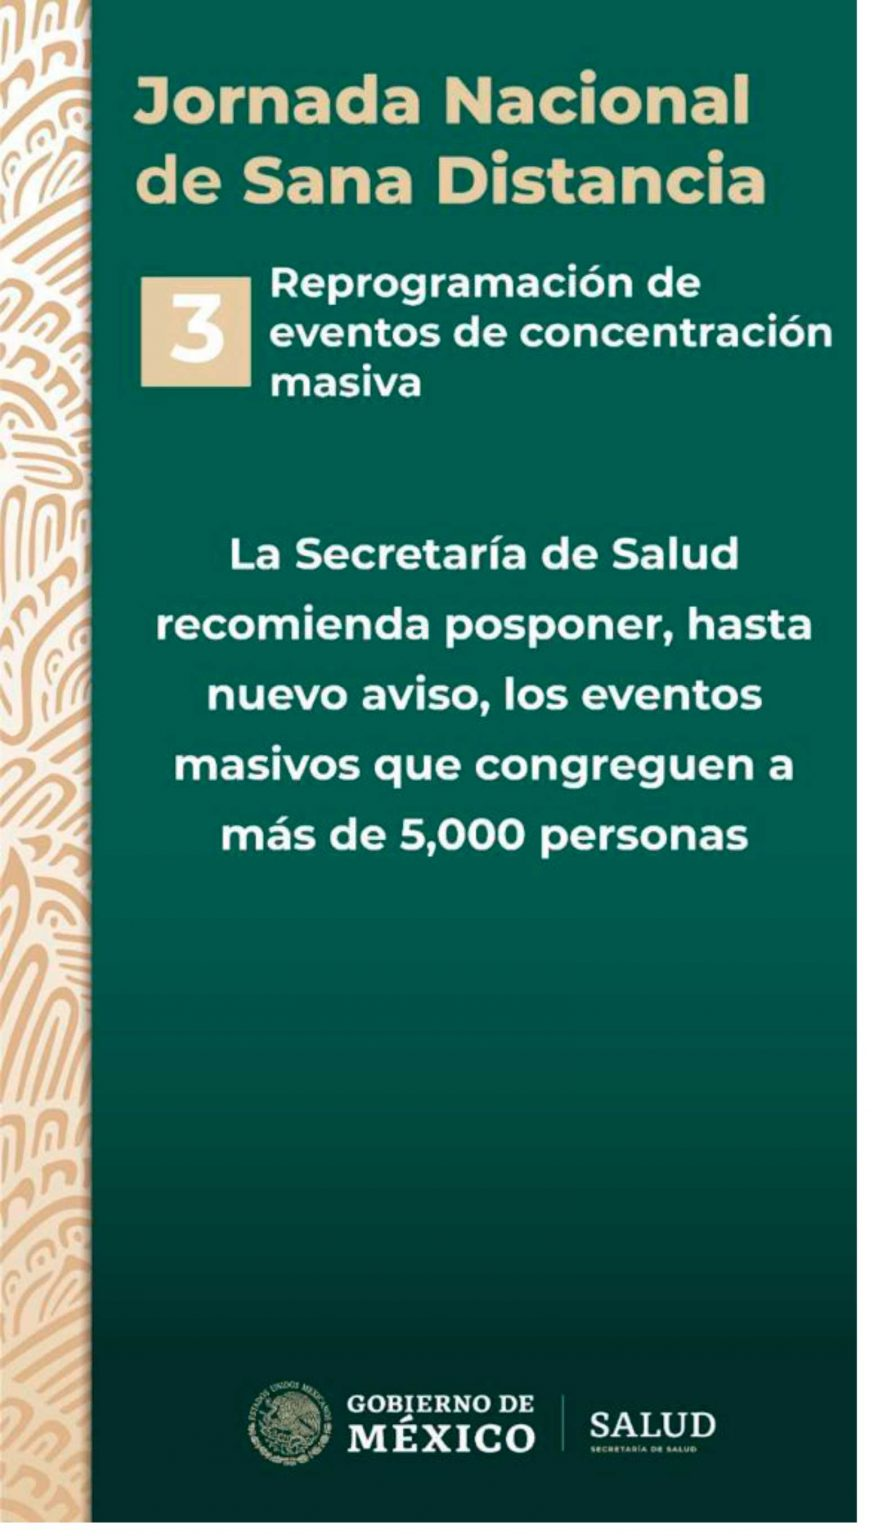 Jornada_Nacional_de_Sana_Distancia-3